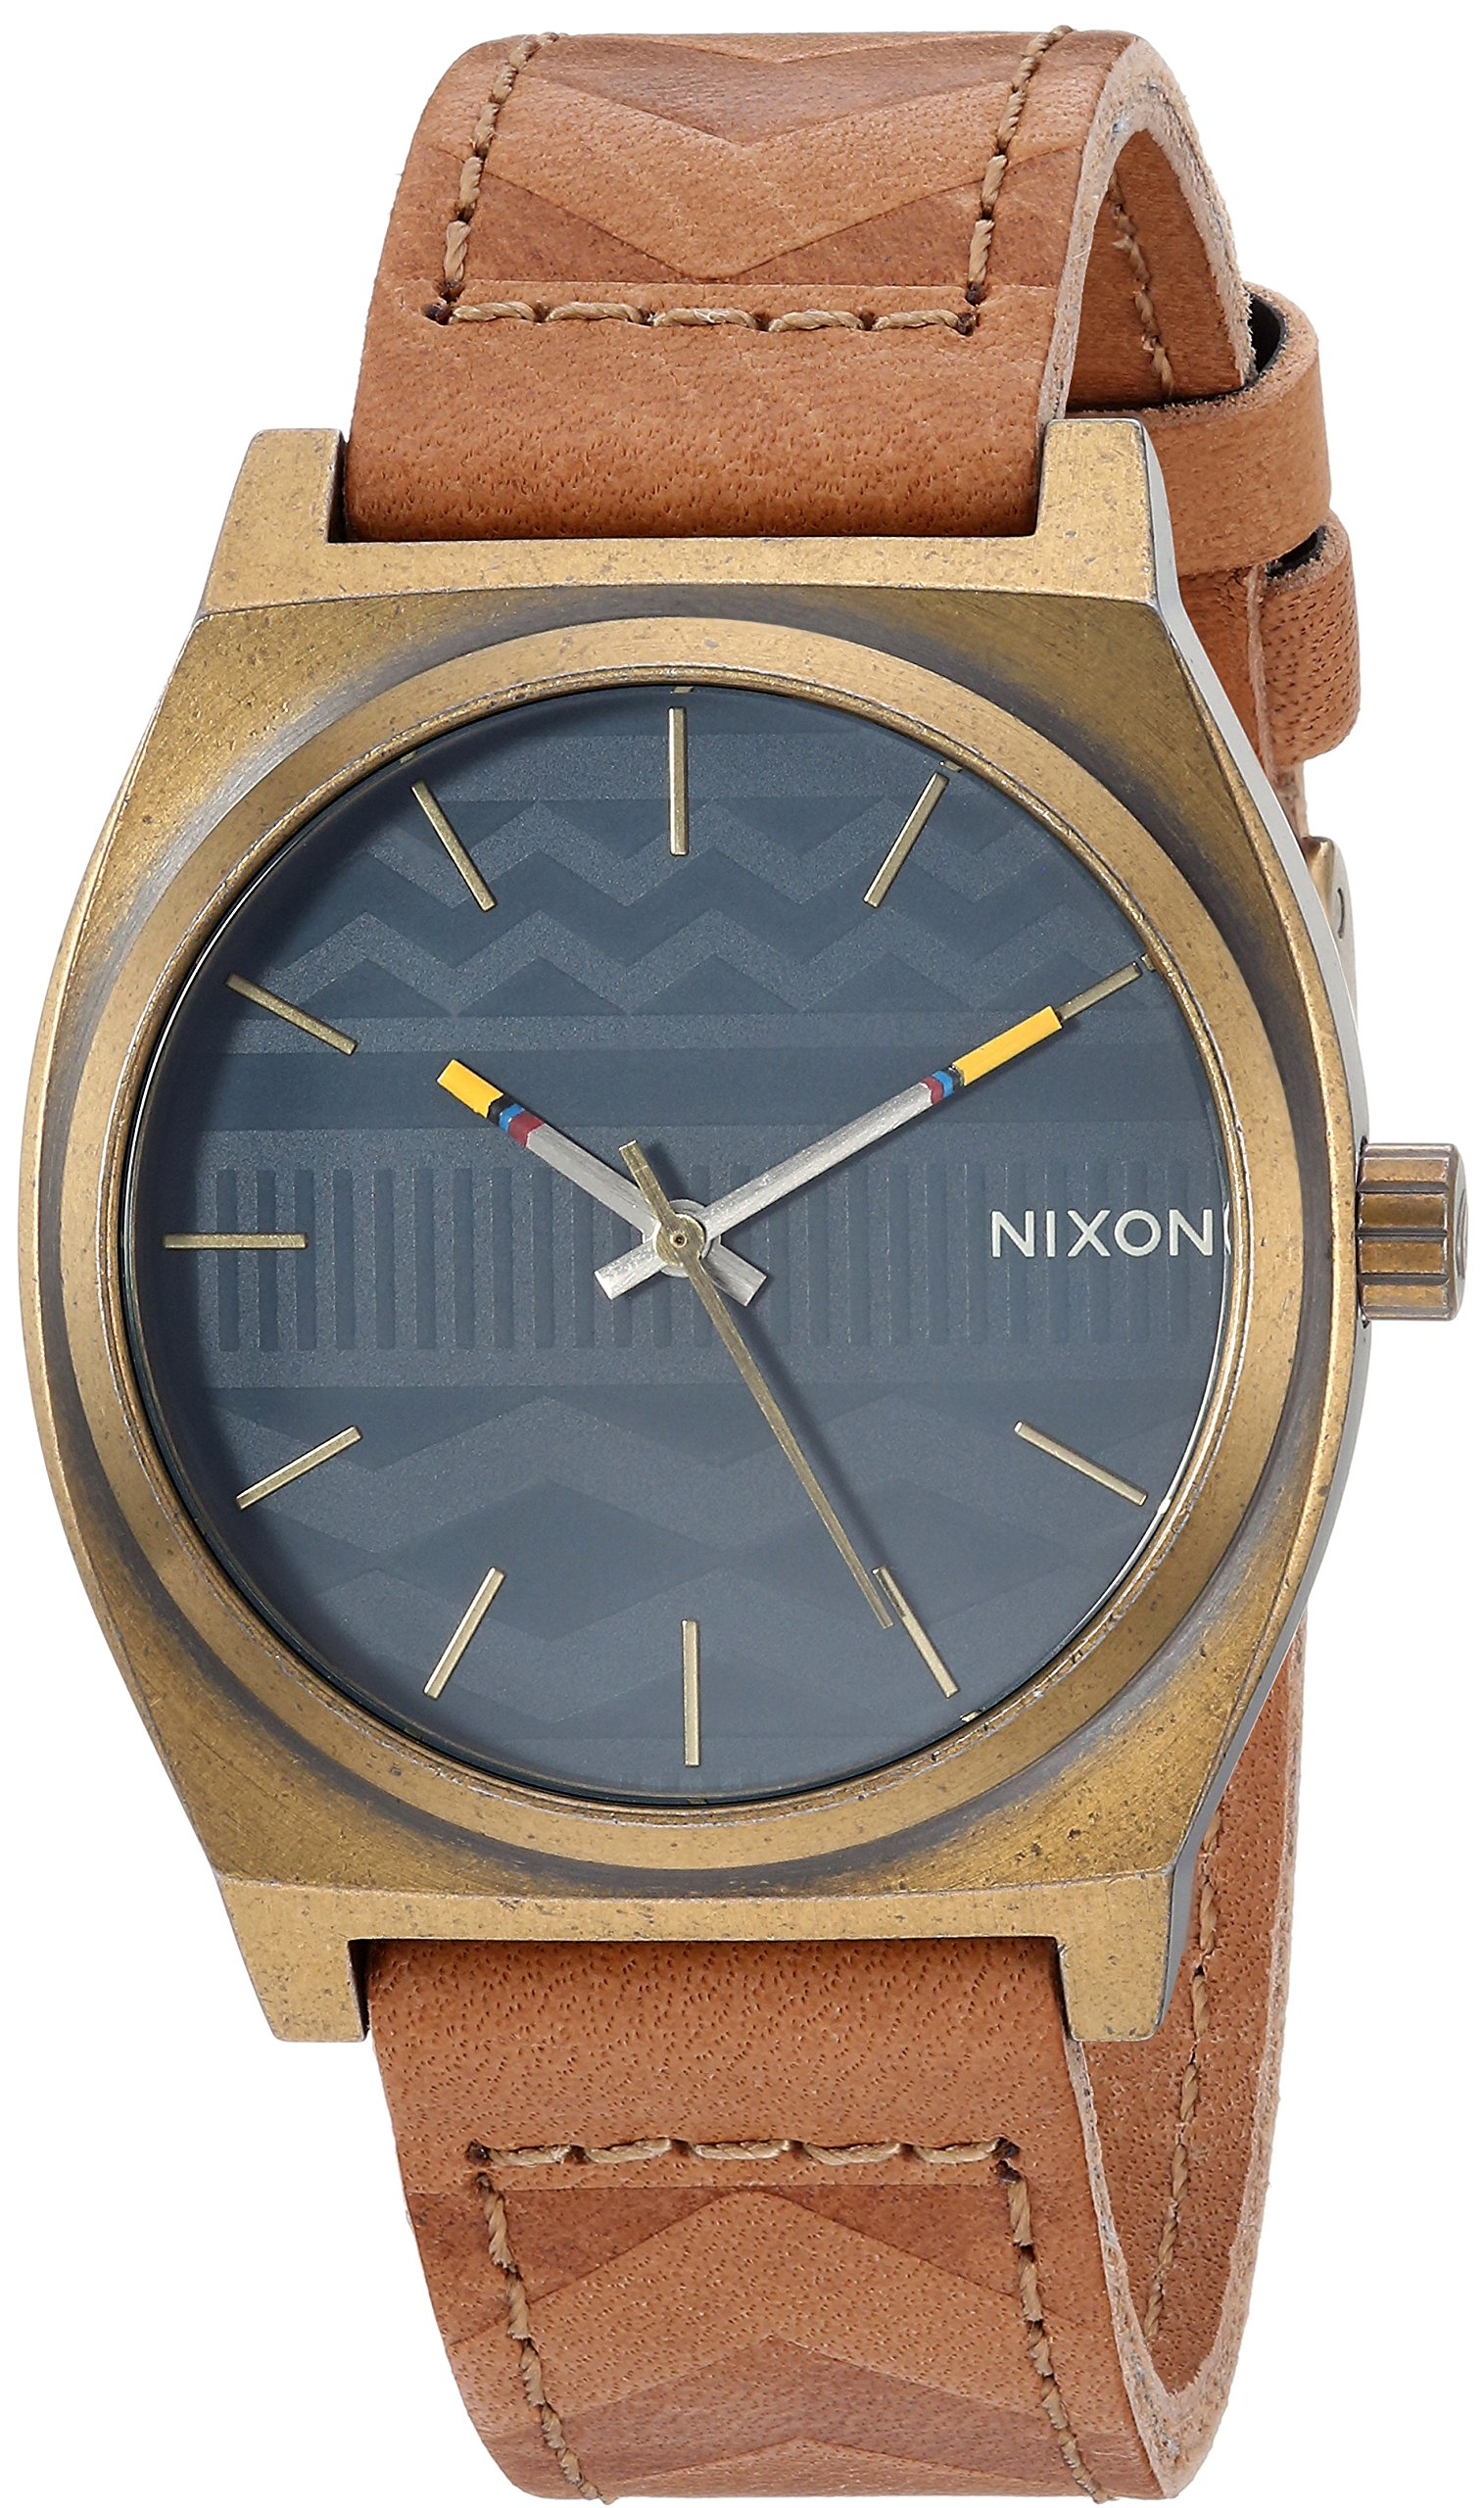 Nixon Men's 'Time Teller' Quartz Stainless Steel Casual Watch, Color Brown (Model: A0452731)